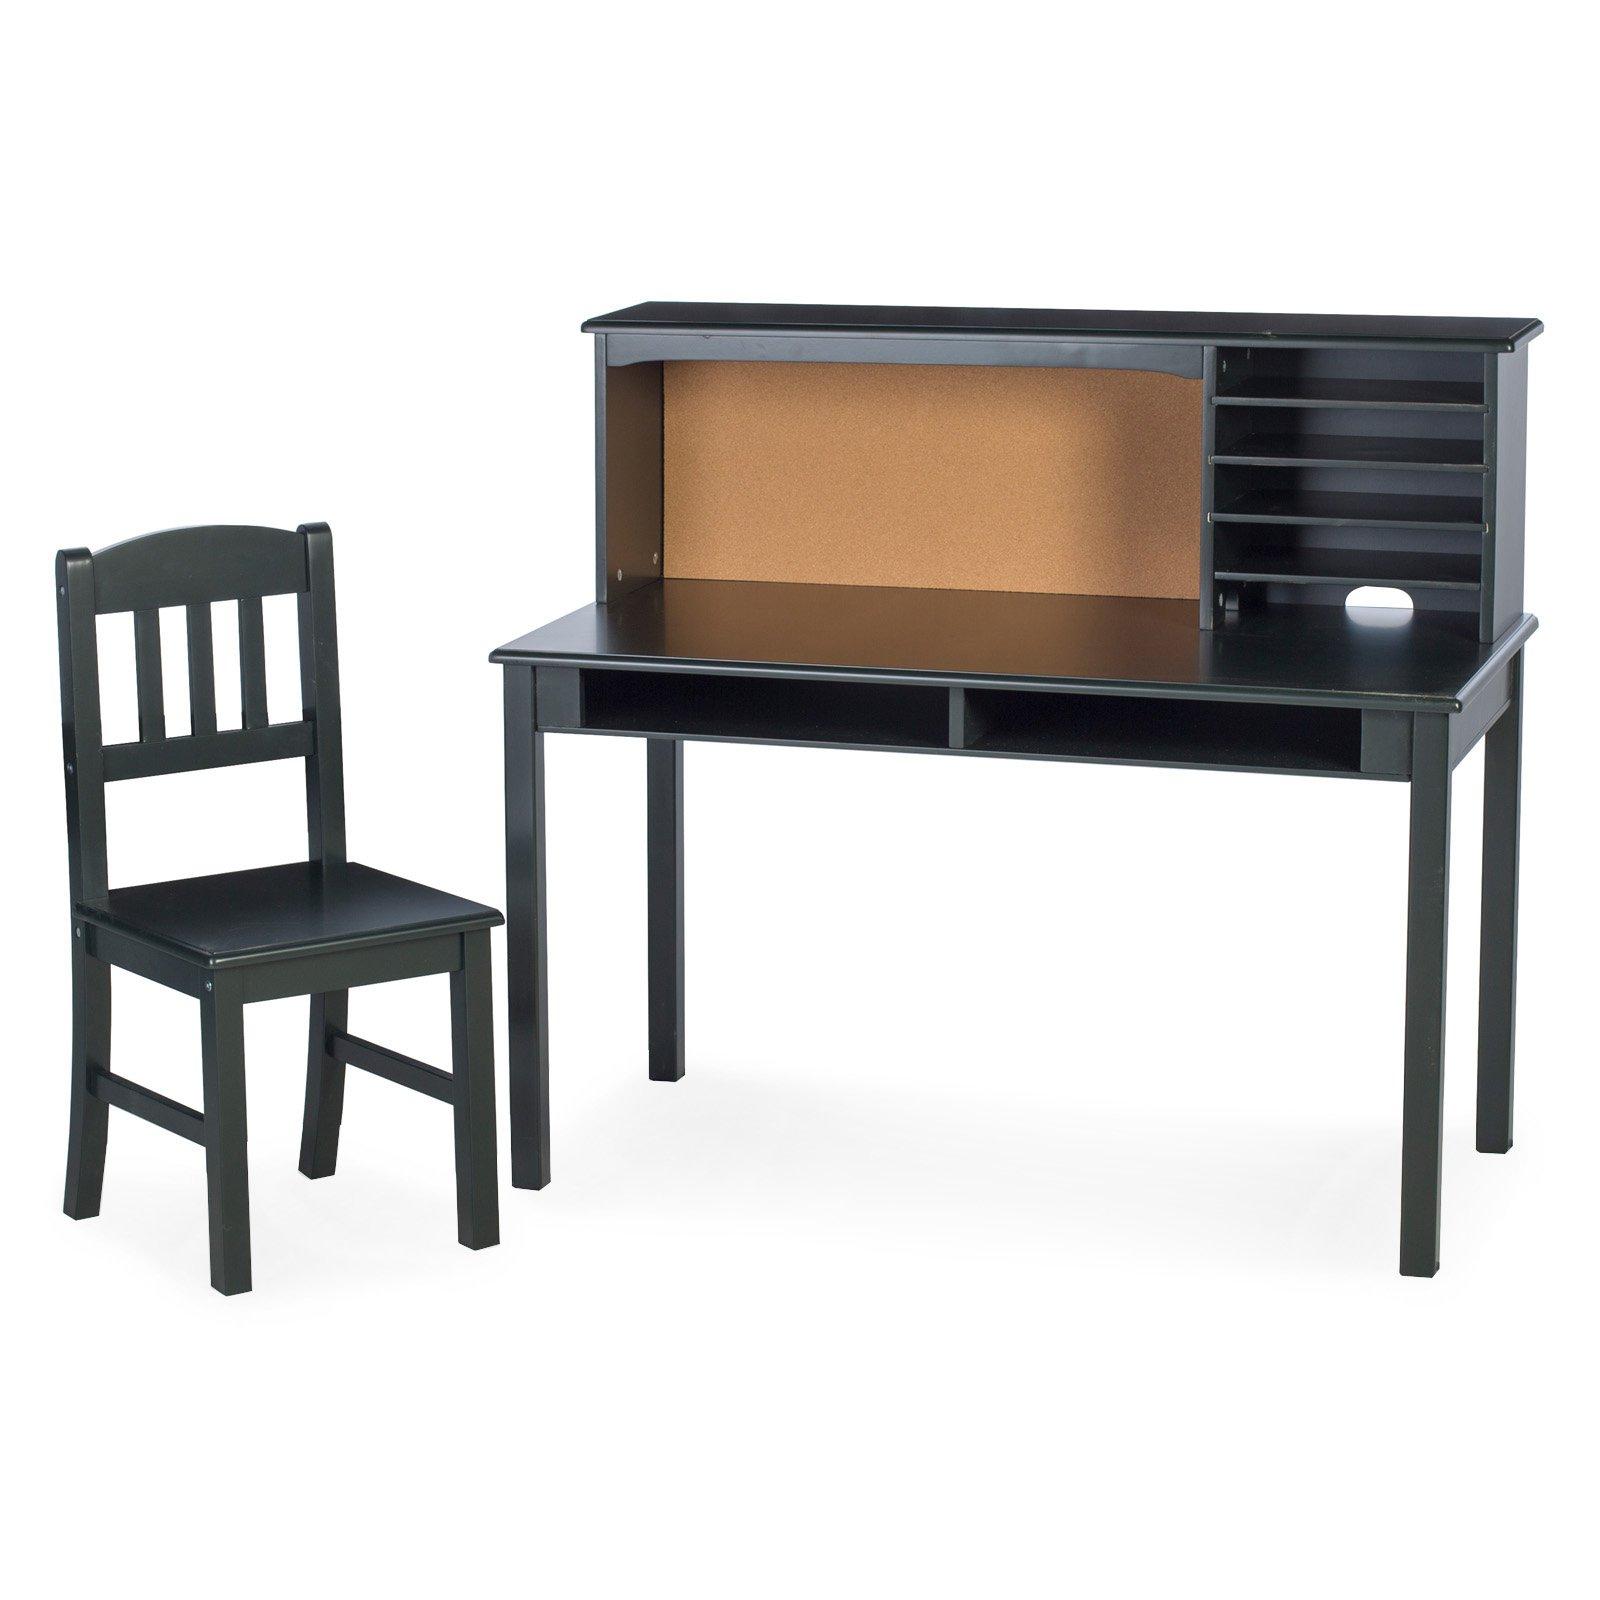 Guidecraft Kids Media Writing Desk & Chair Set - Black